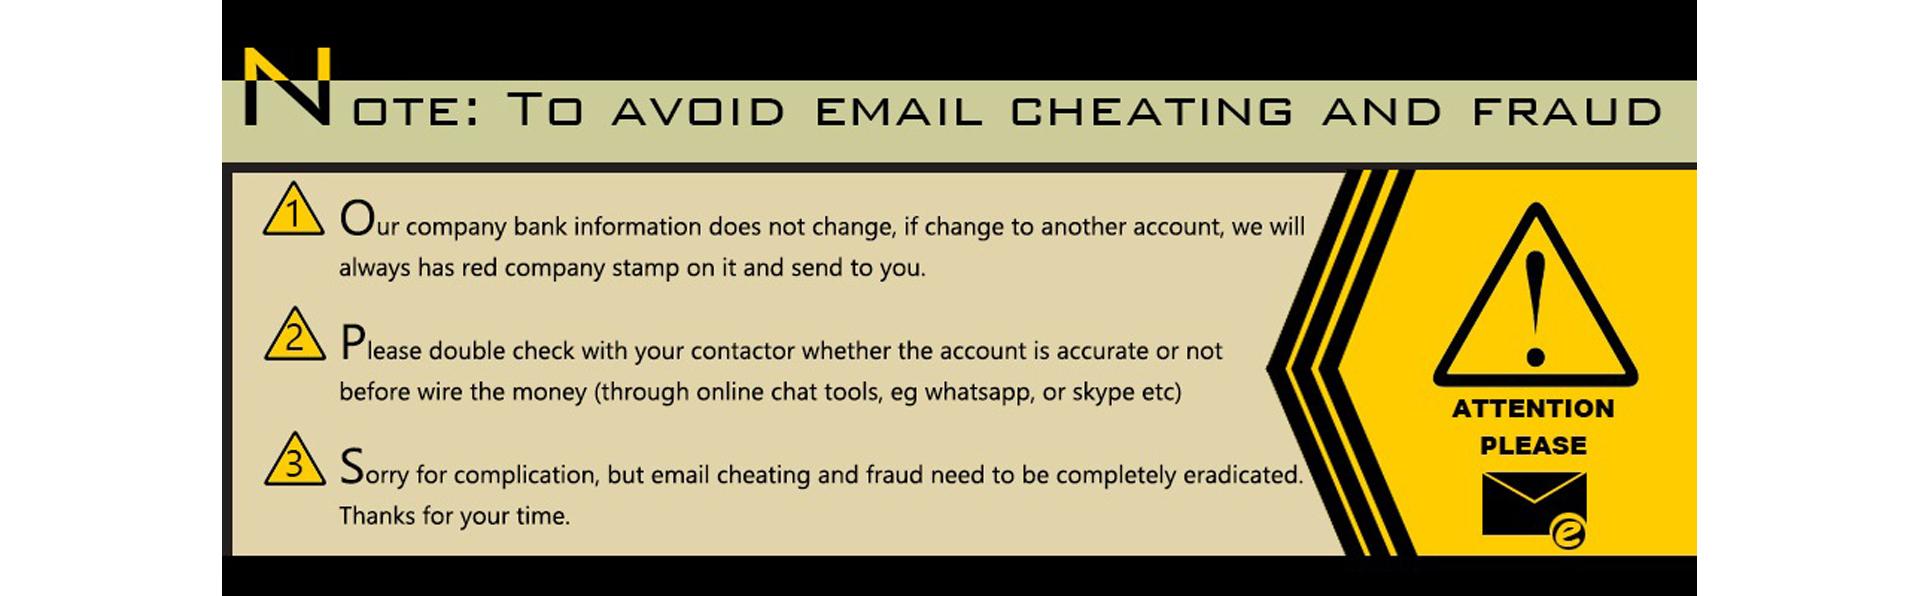 Avoid internet fraud